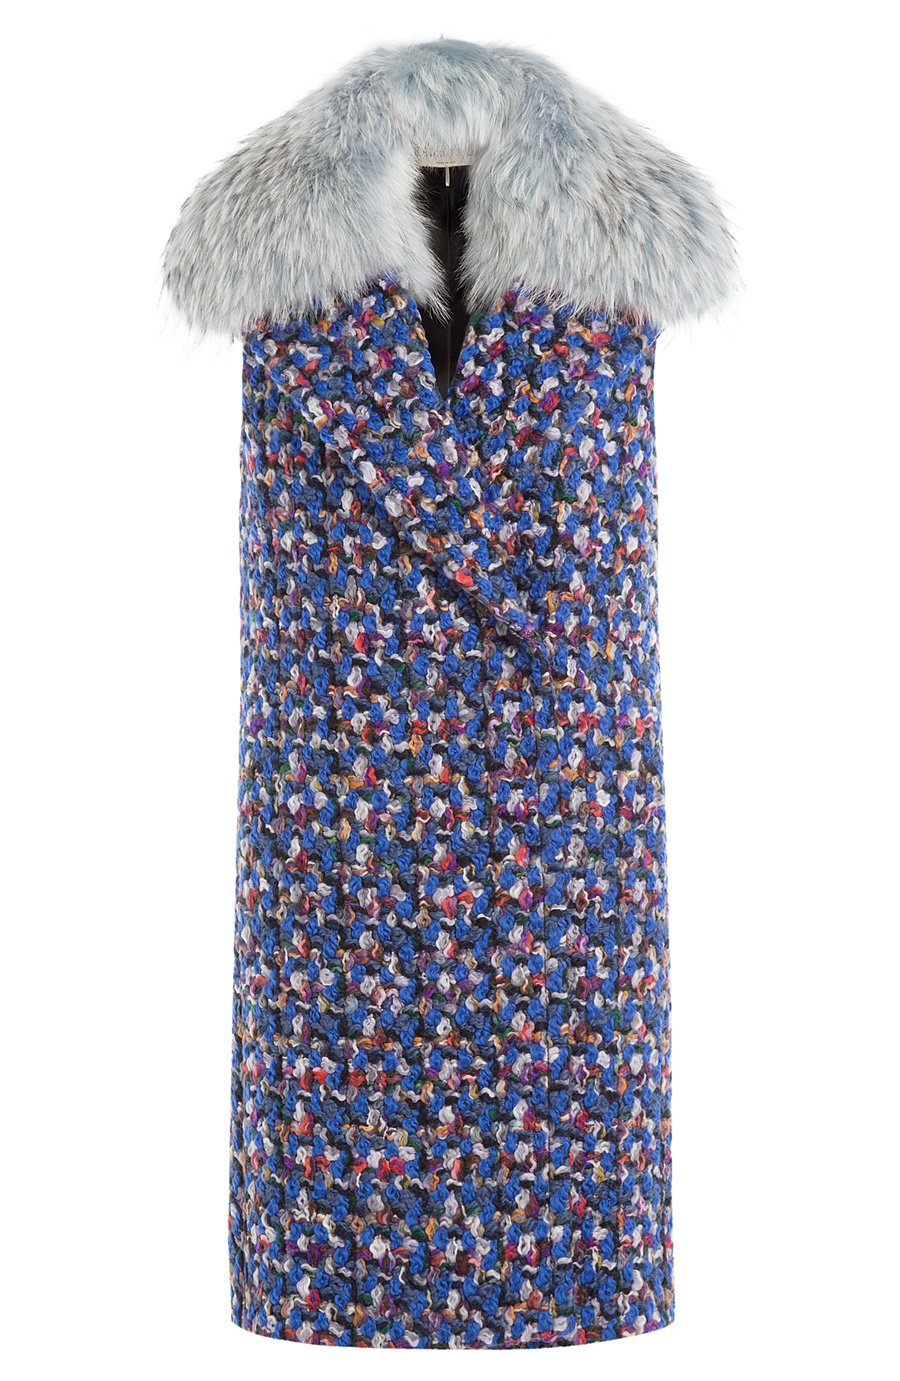 Emilio Pucci Virgin Wool Sleeveless Coat With Fur Collar In Multicolored